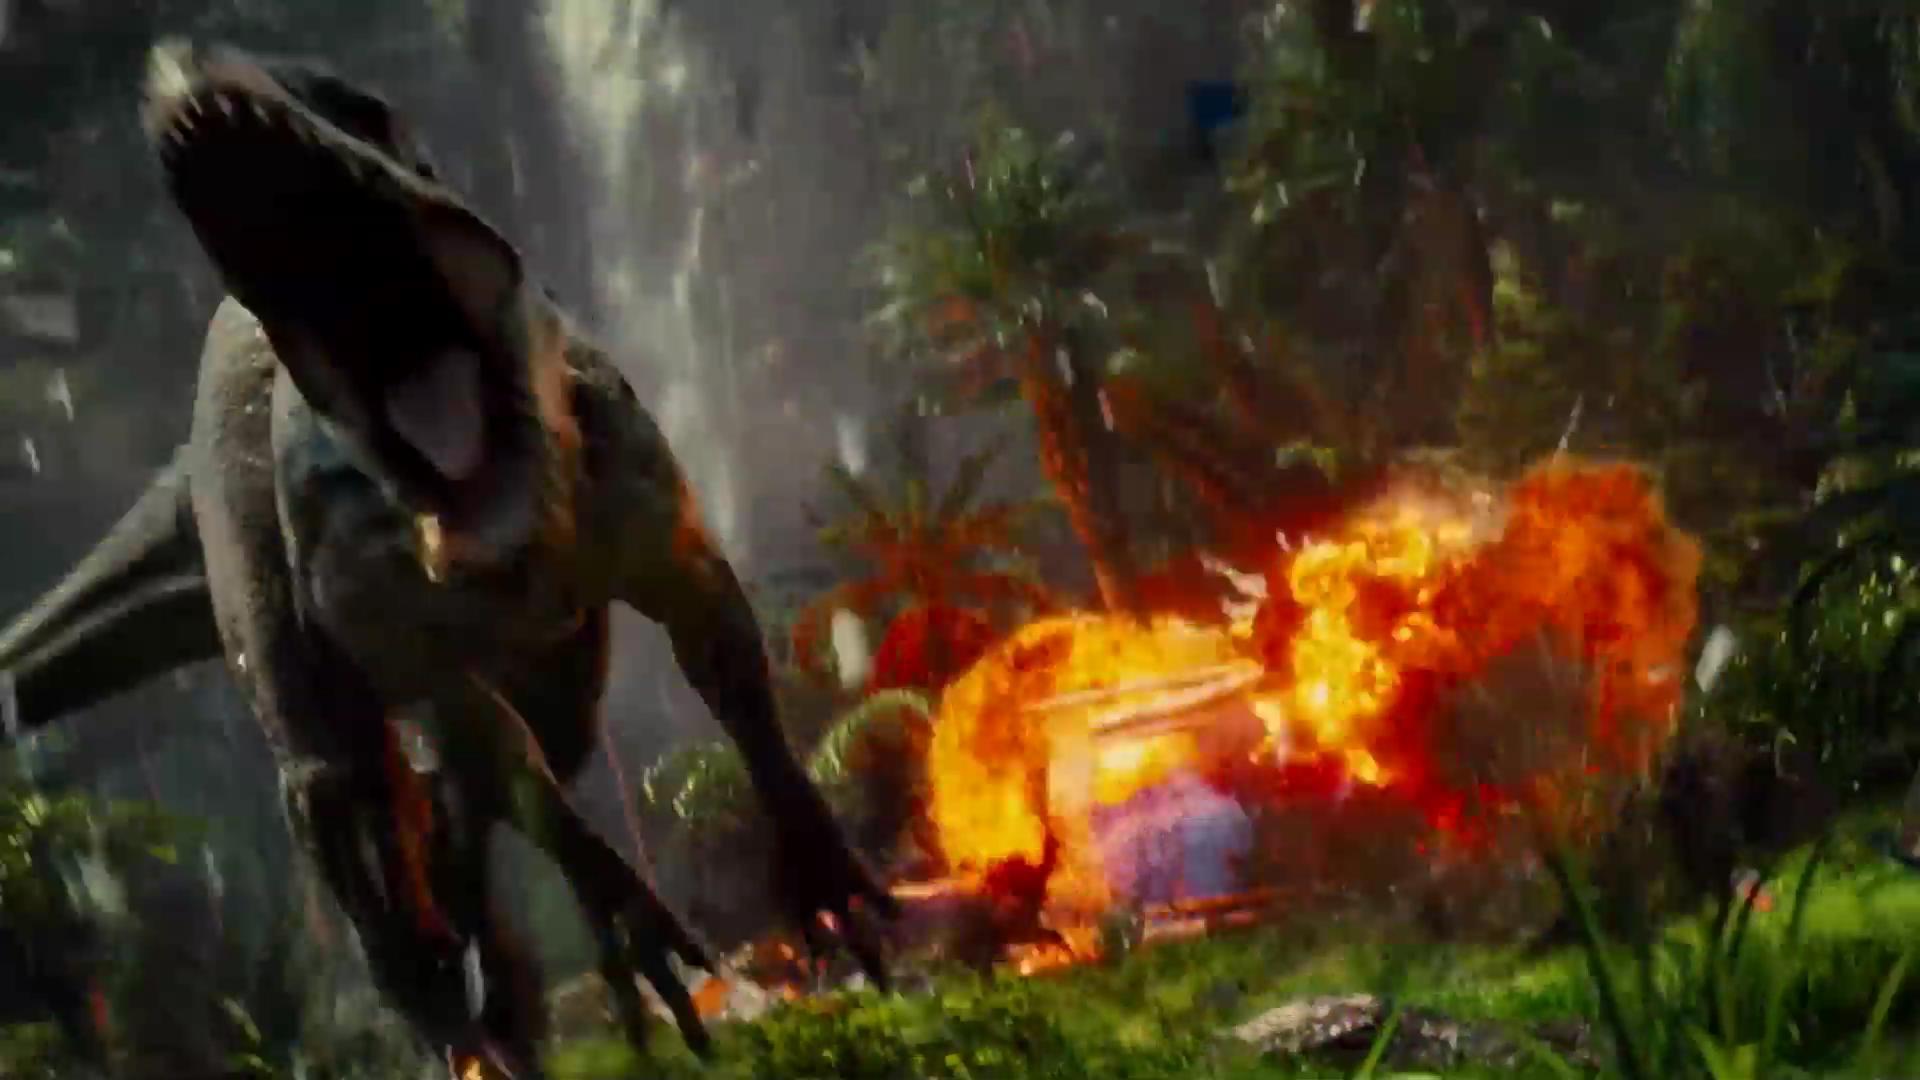 Meet the dino that inspired 'Jurassic World's' Indominus Rex